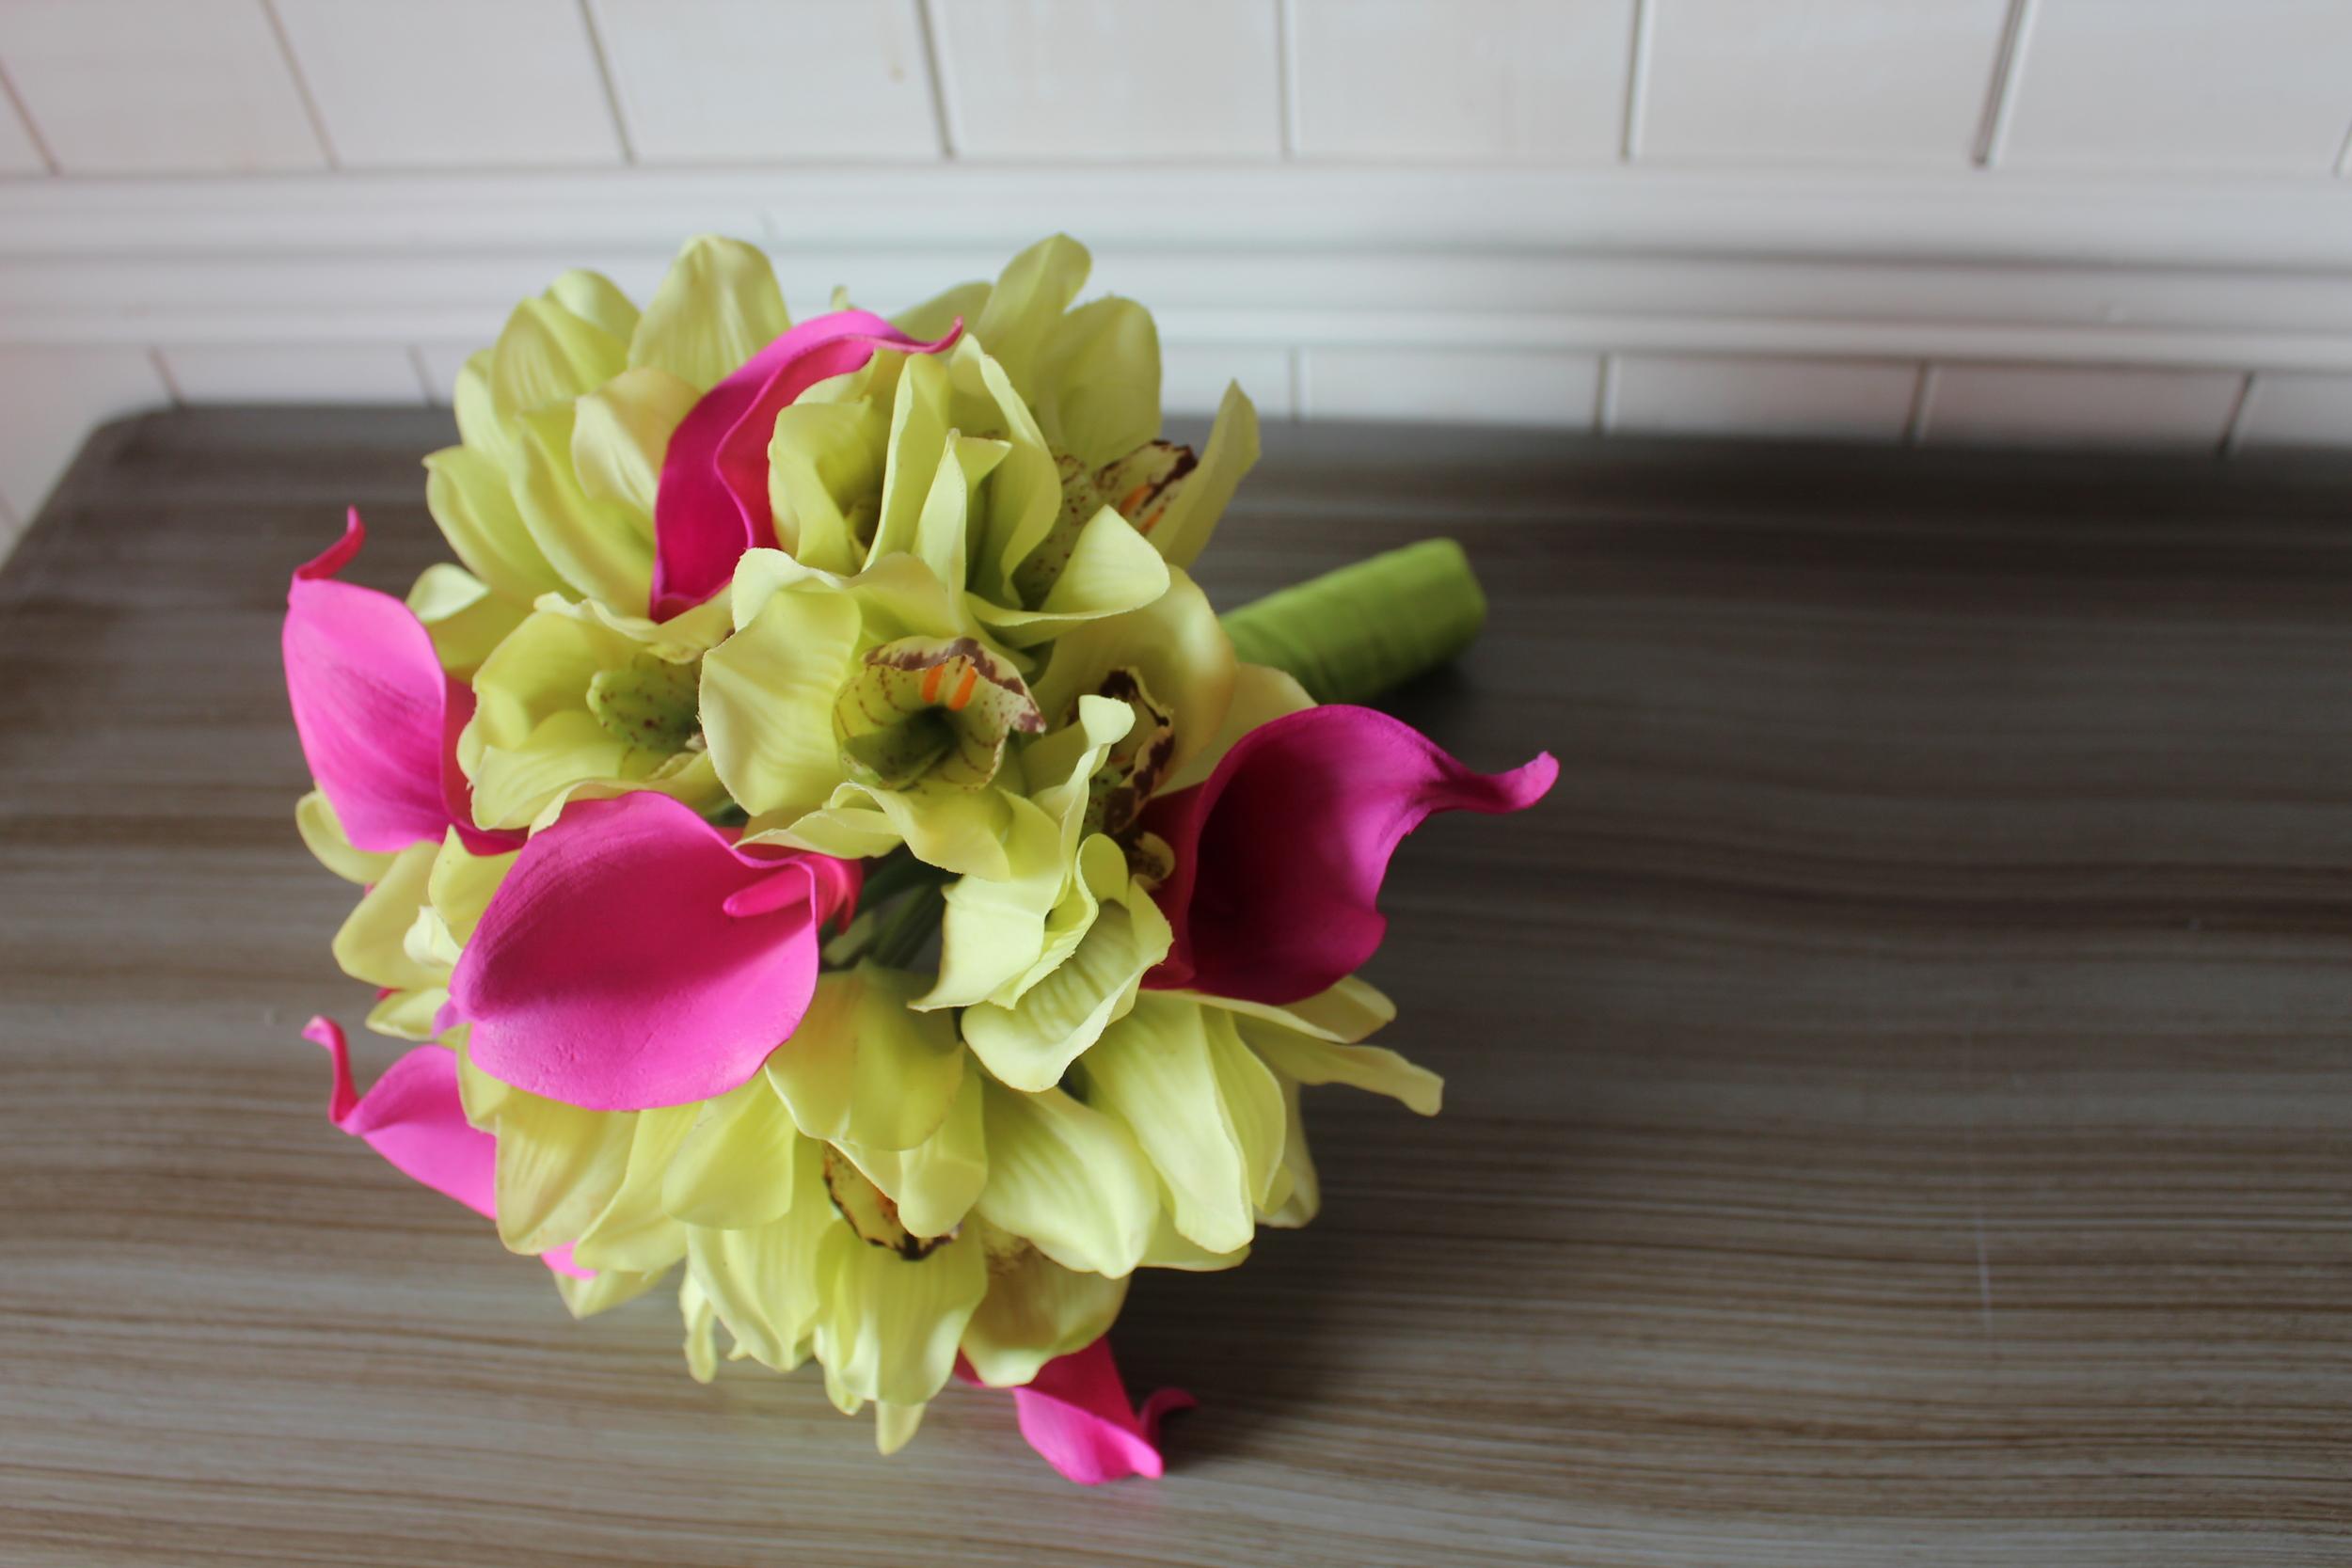 minneapolis-silk-wedding-florist-bridal-bouquets-destination-wedding.jpg